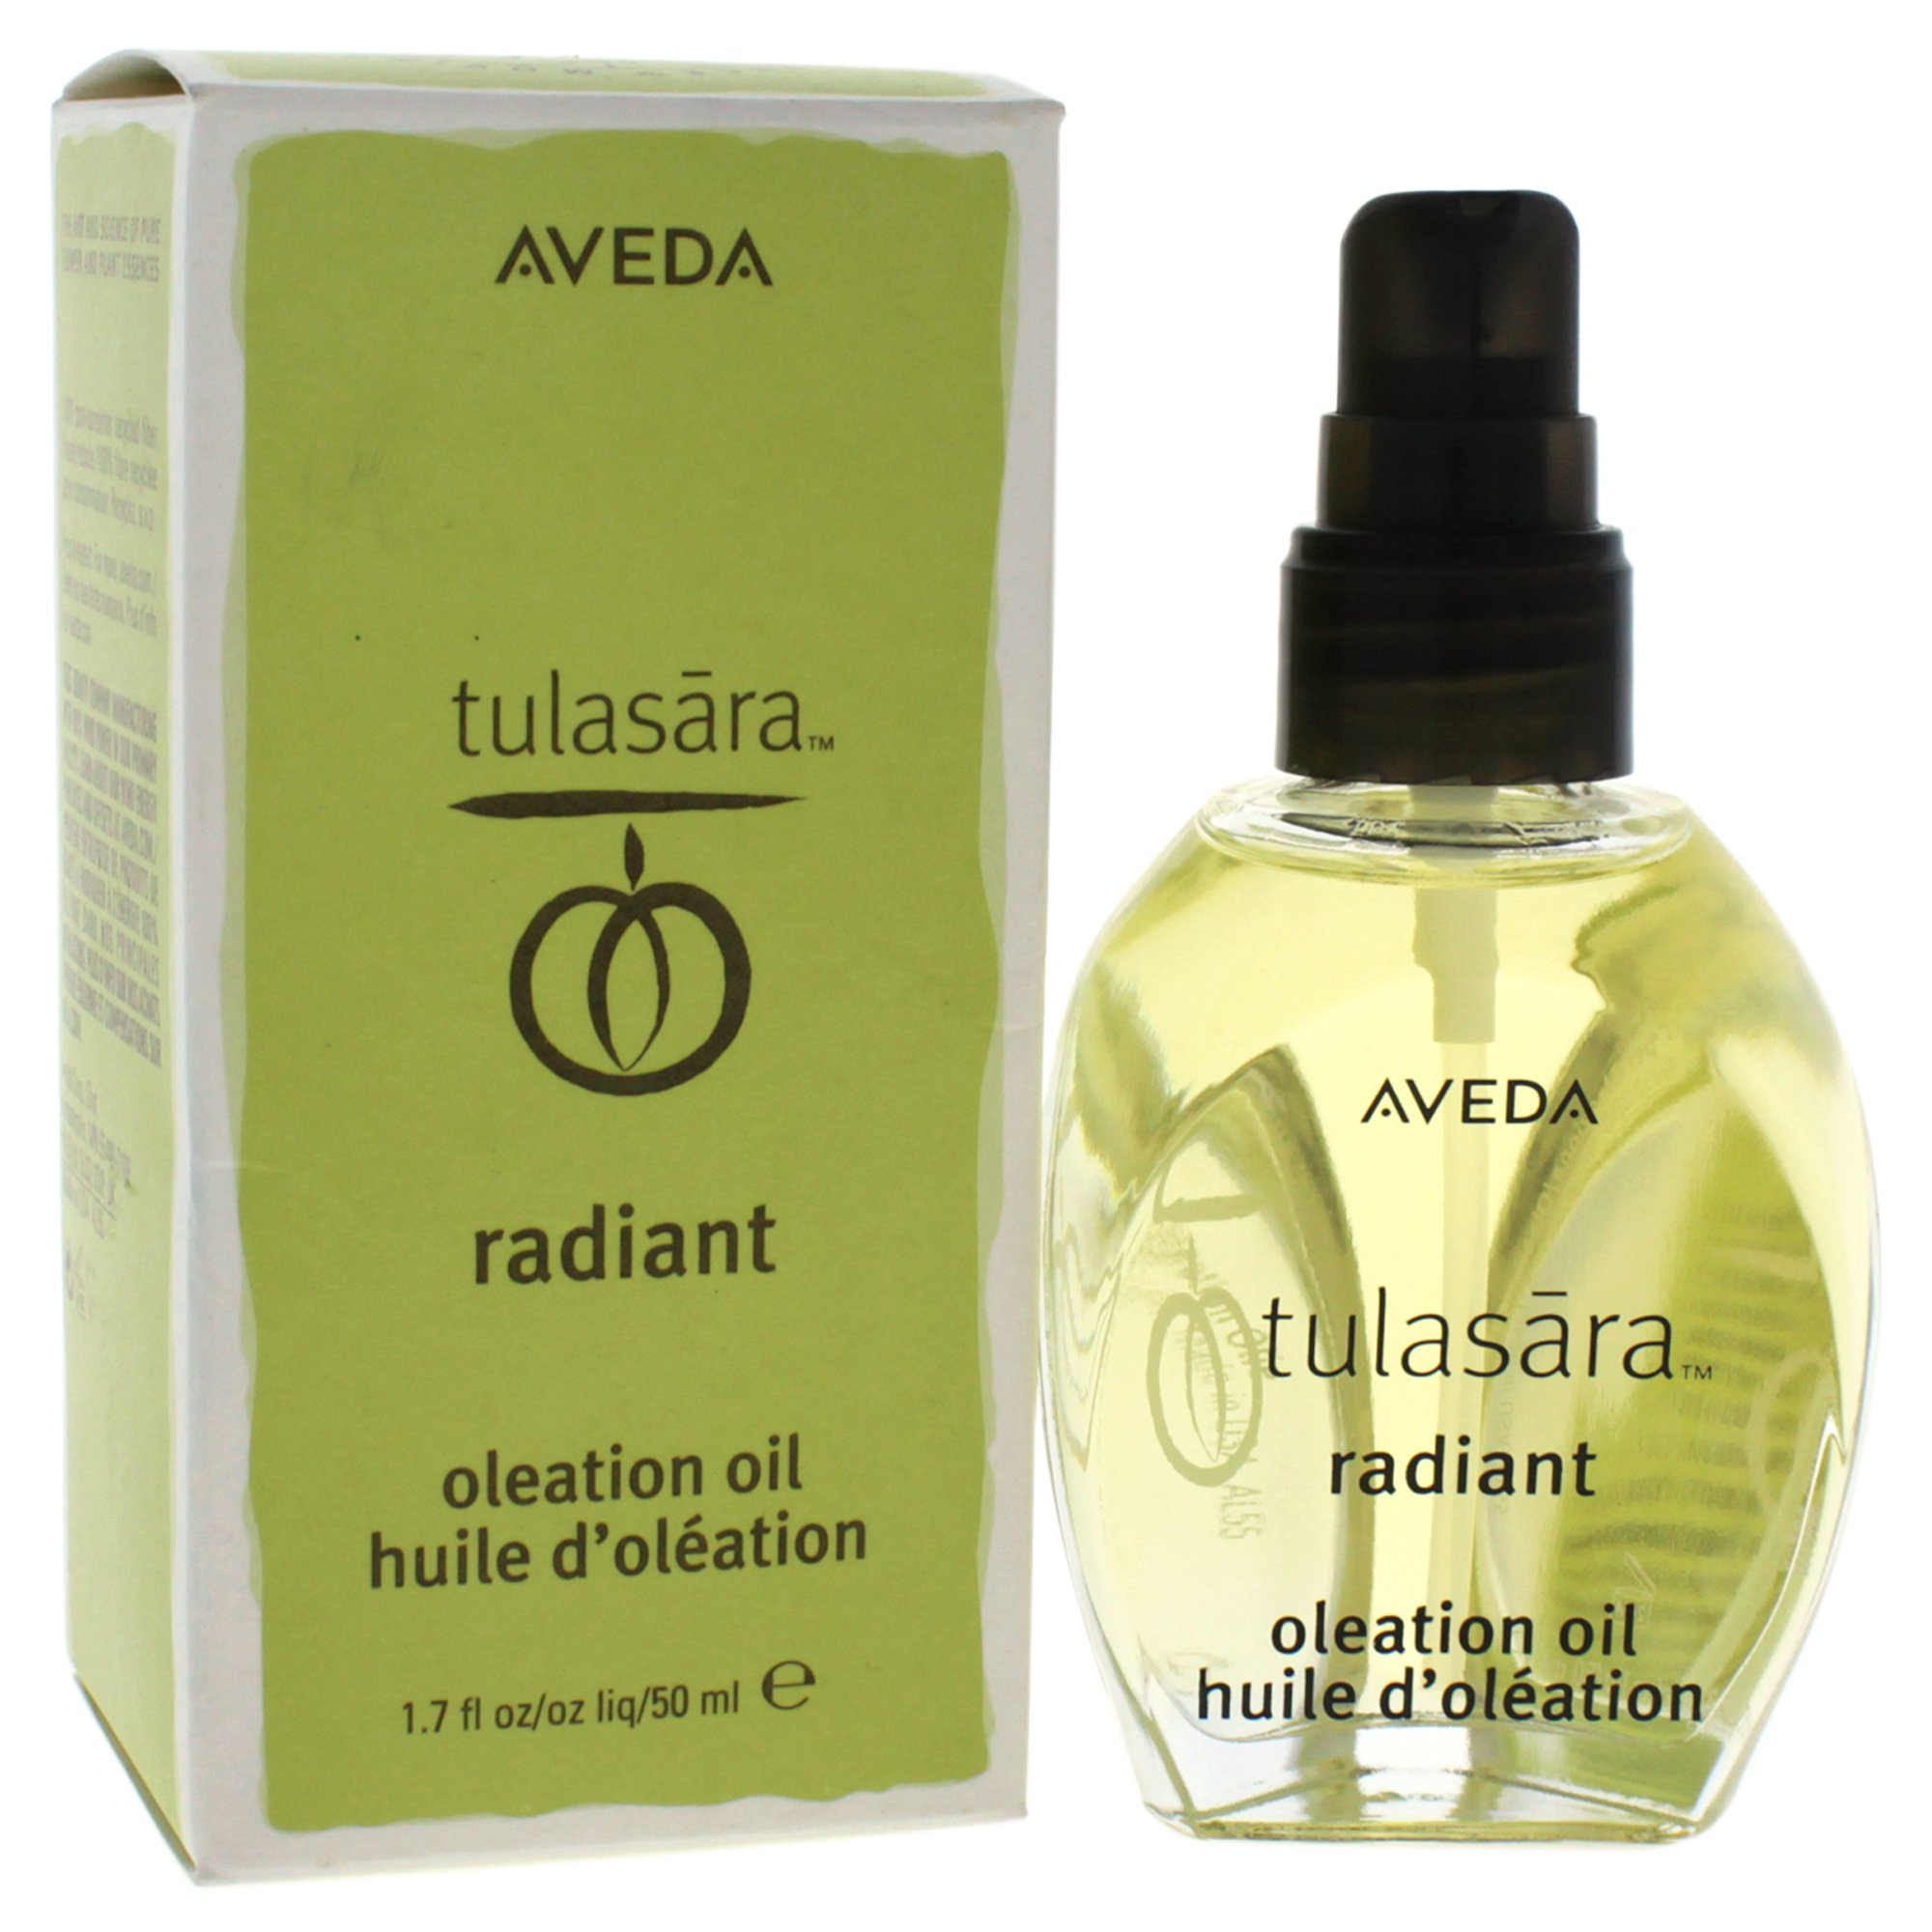 Aveda Tulasara Radiant Professsional Facial Dry Skin Brush Nlife Half Face Anti Wrinkle Lift V Face Line Slim Up Slimming Cheek Face Shaper Mask